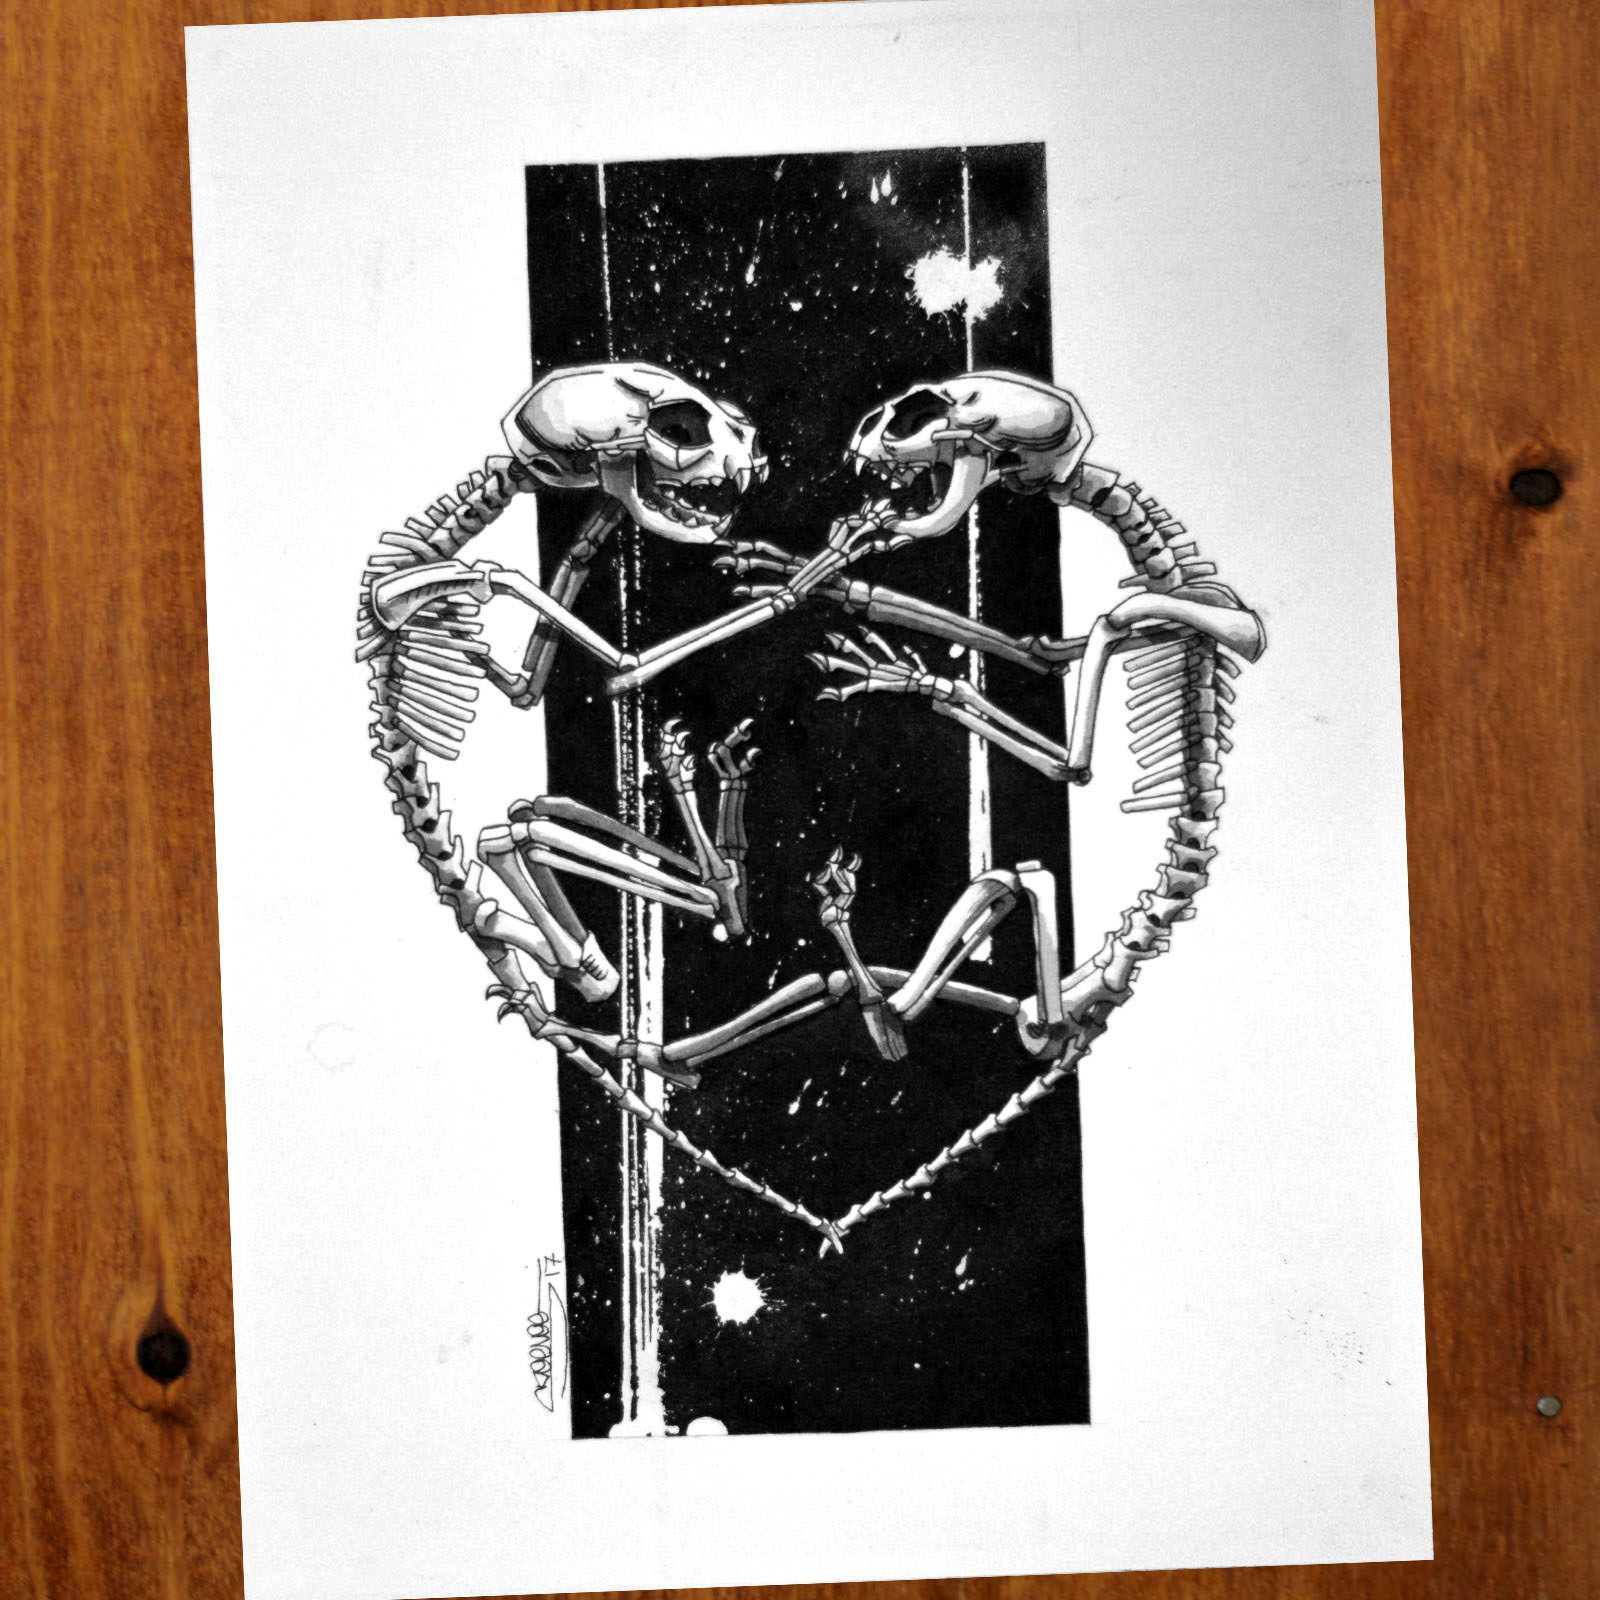 Kitten Skeletons Painting Inspired By The Very Talented Tom S Imagination Fountain Pen Sumi Ink Kitten Skullart Blackartist Inkdrawing S Dengan Gambar Fountain Pen